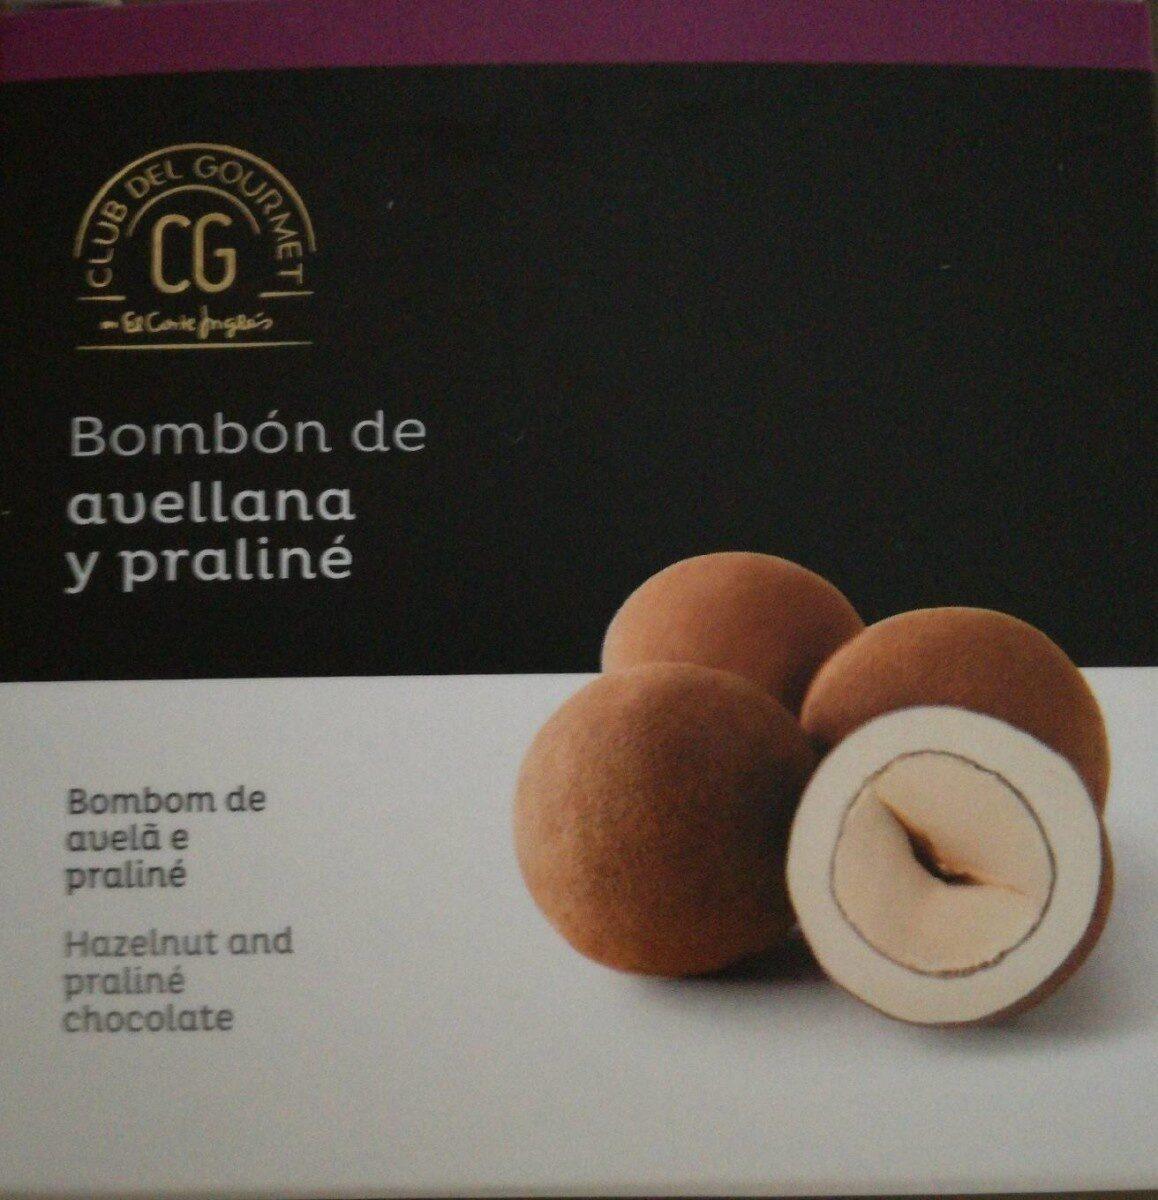 Bombón de avellana y praliné - Product